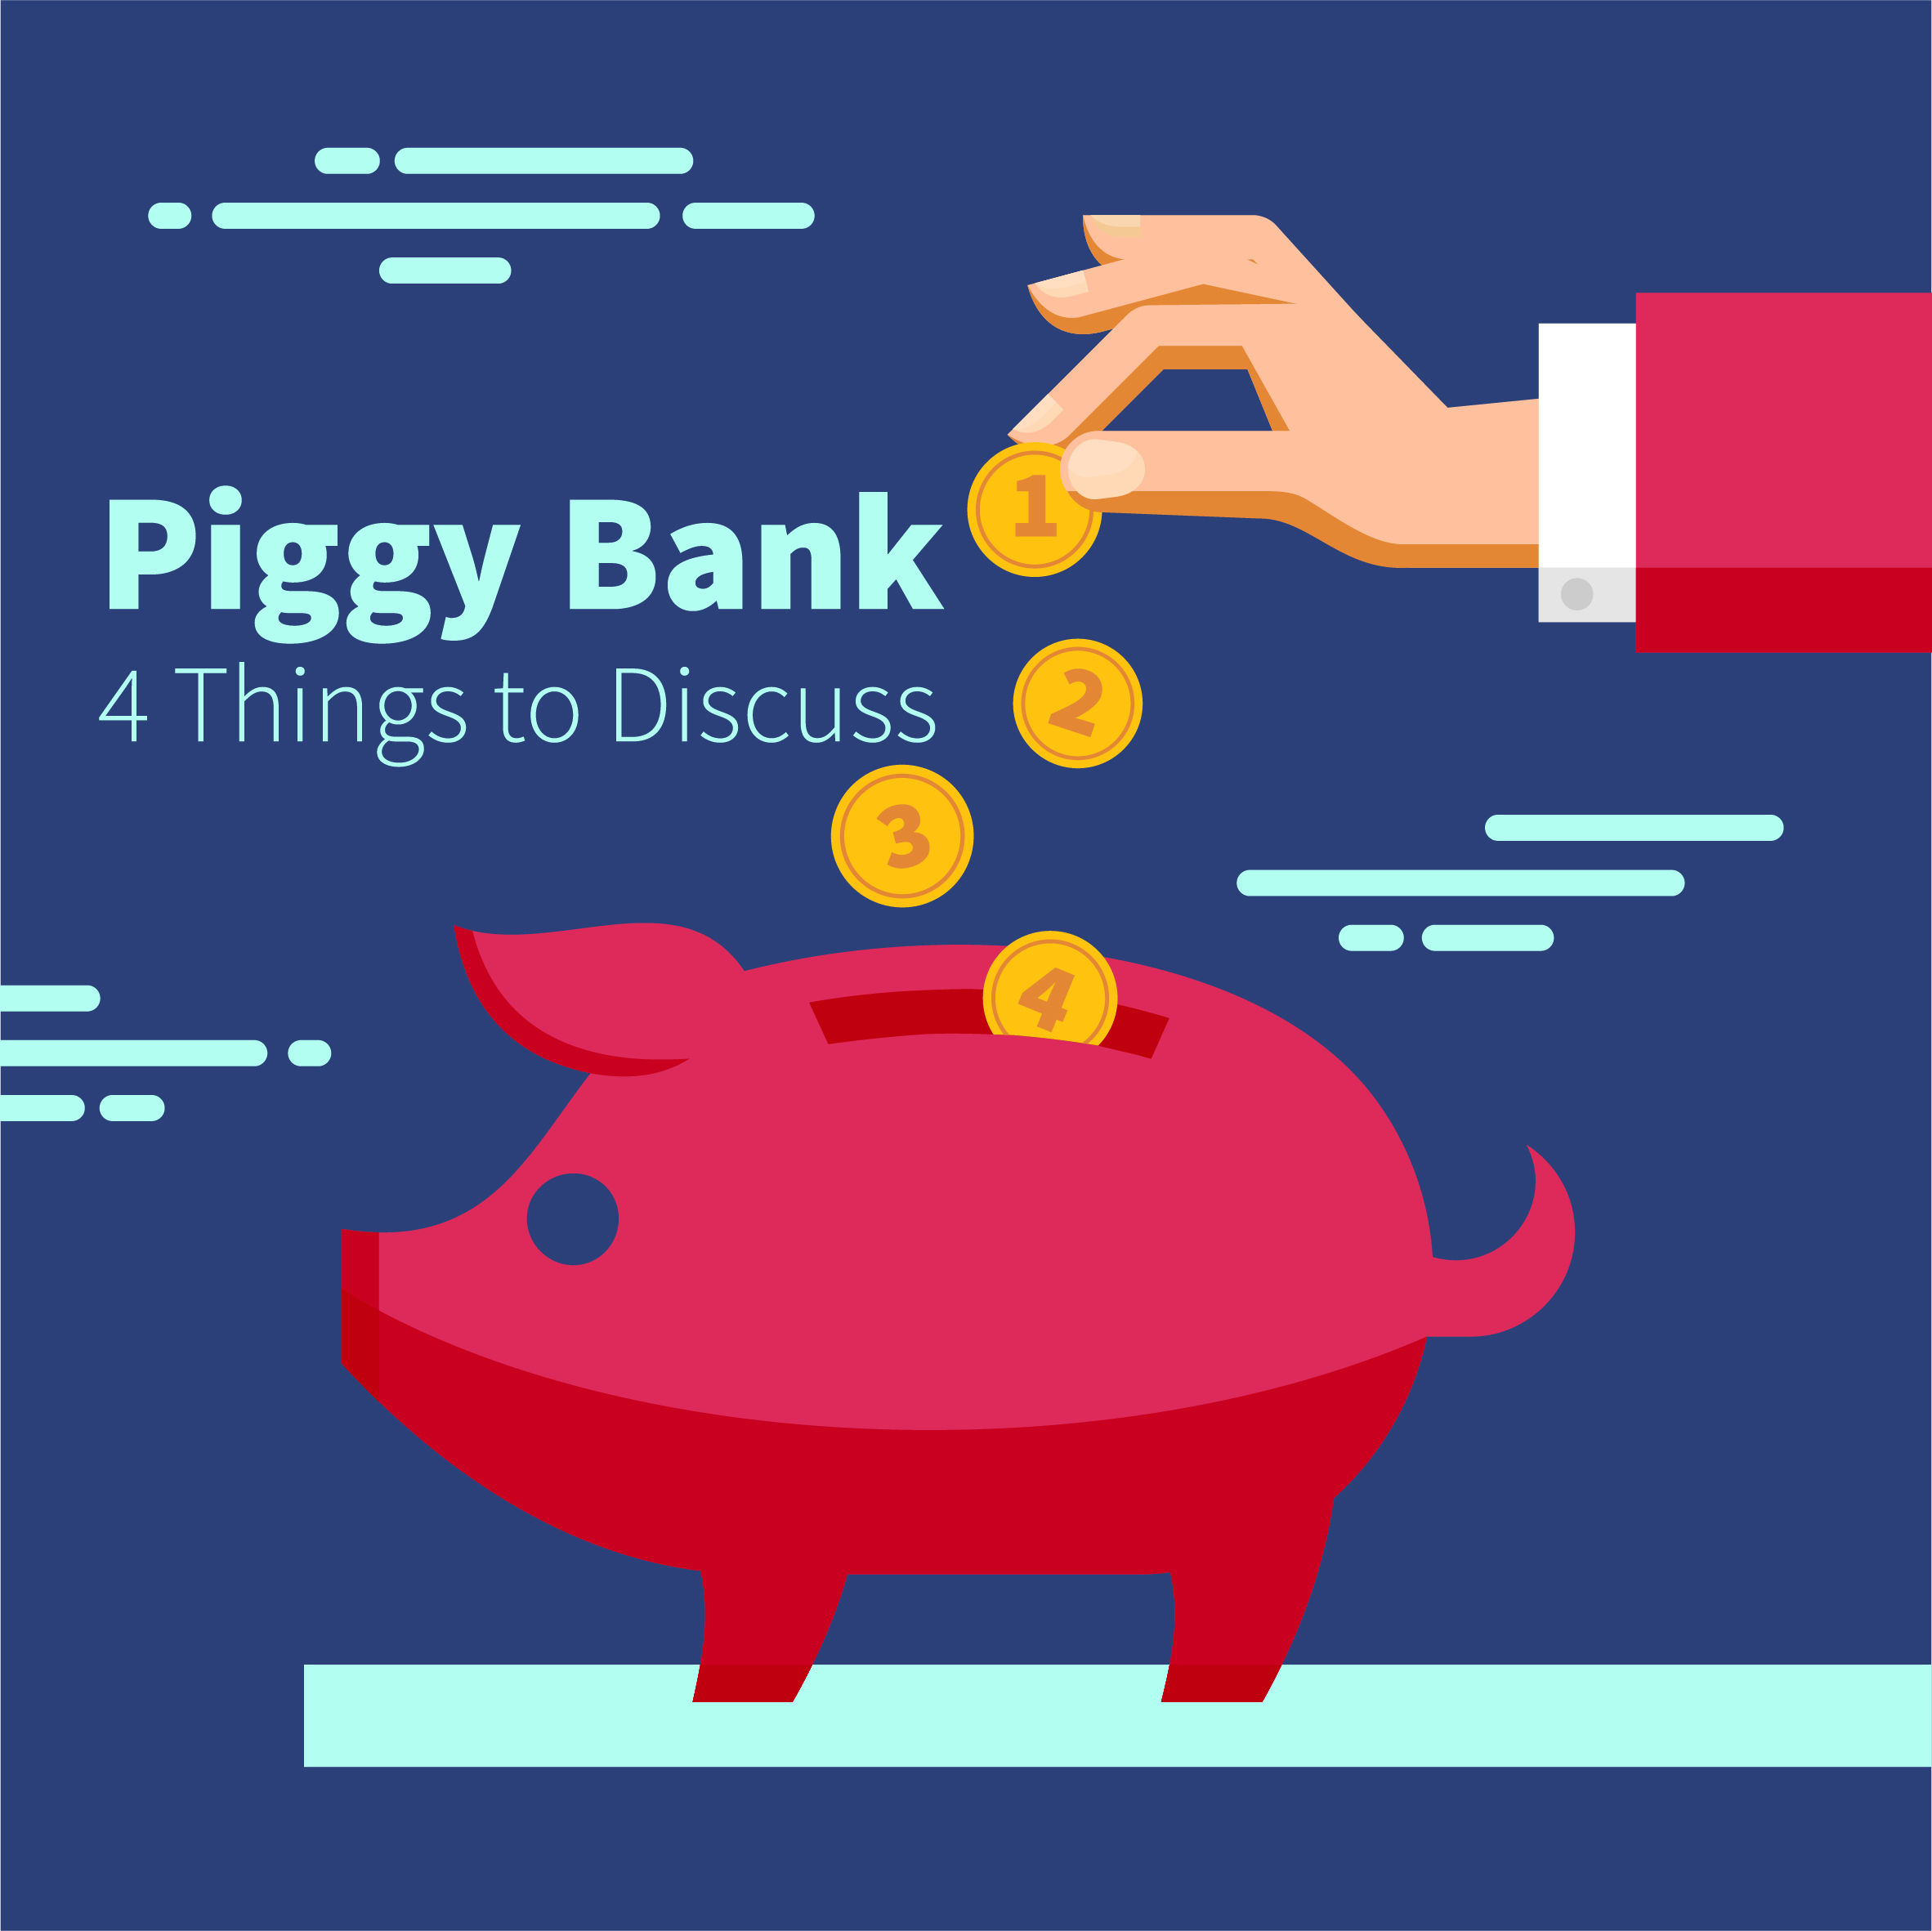 Piggy bank 4 things blog-01.jpg